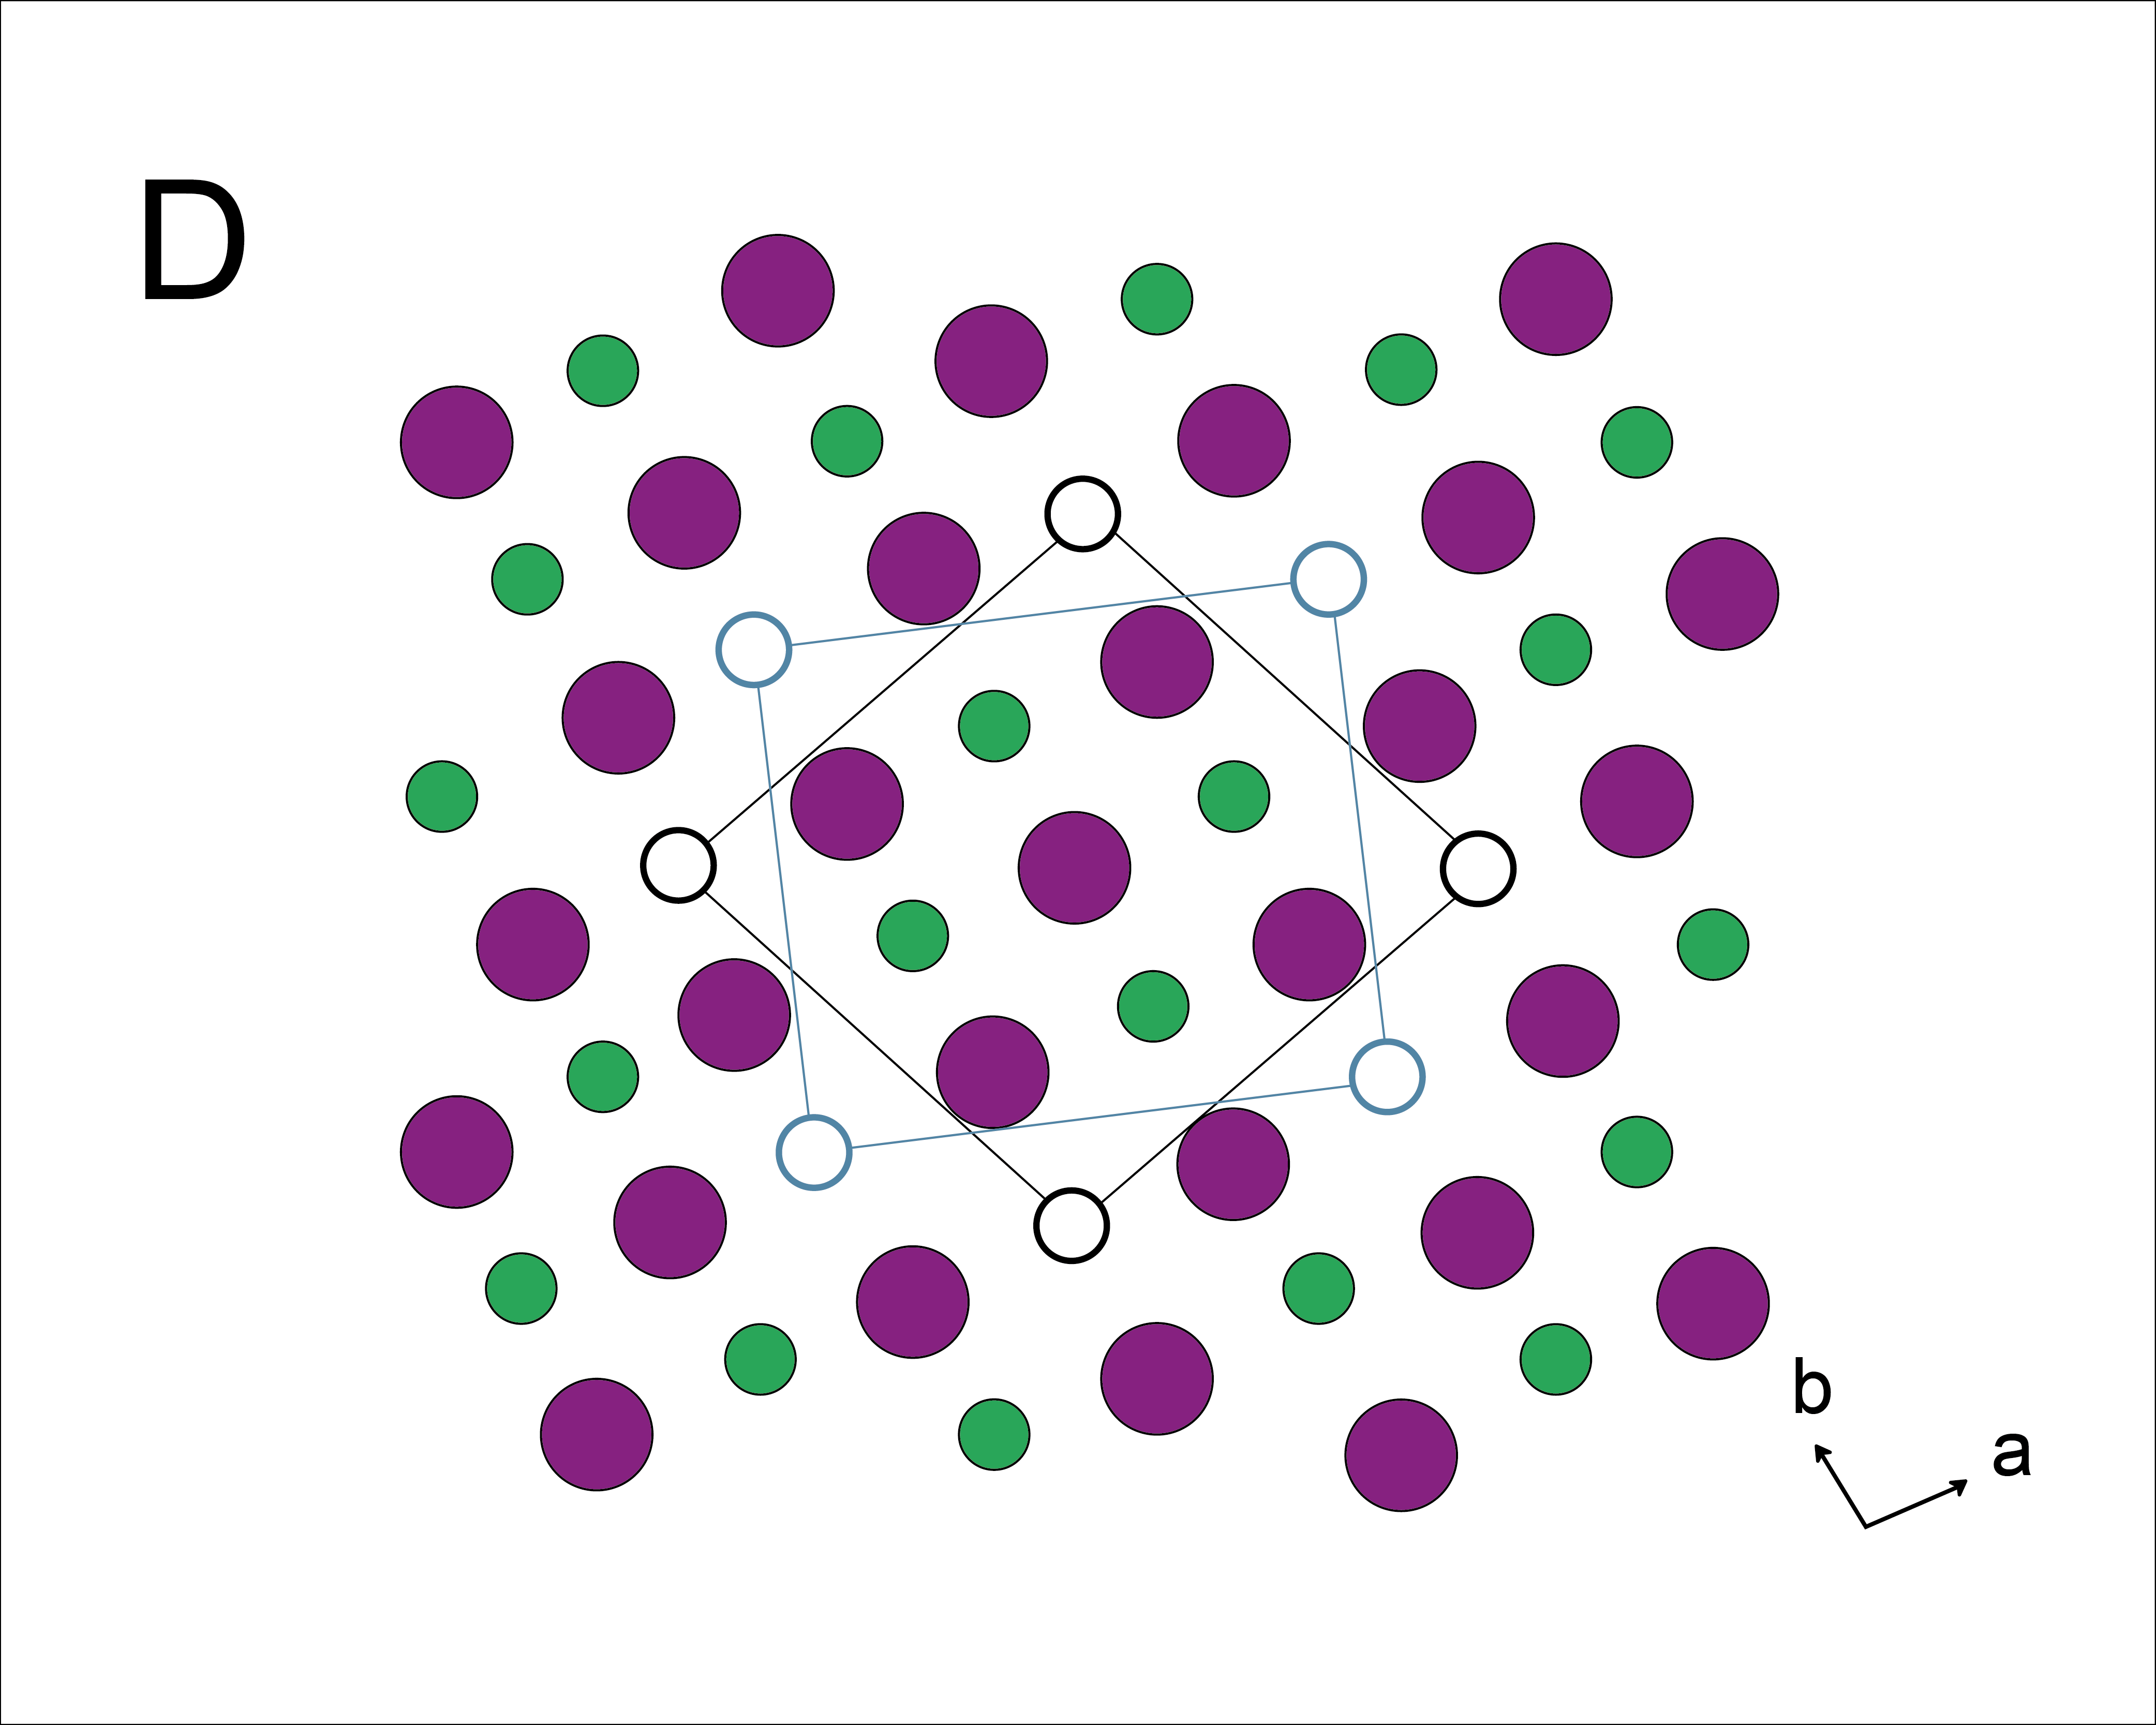 β-Fe4Se5 (一種鐵硒超導) 的單晶結構示意圖,綠色是鐵原子,粉紅色是硒原子,可以看出鐵原子有規律的空缺。圖│〈高溫超導的鐵器時代─從「銅基超導」到「鐵基超導」〉,作者:吳茂昆